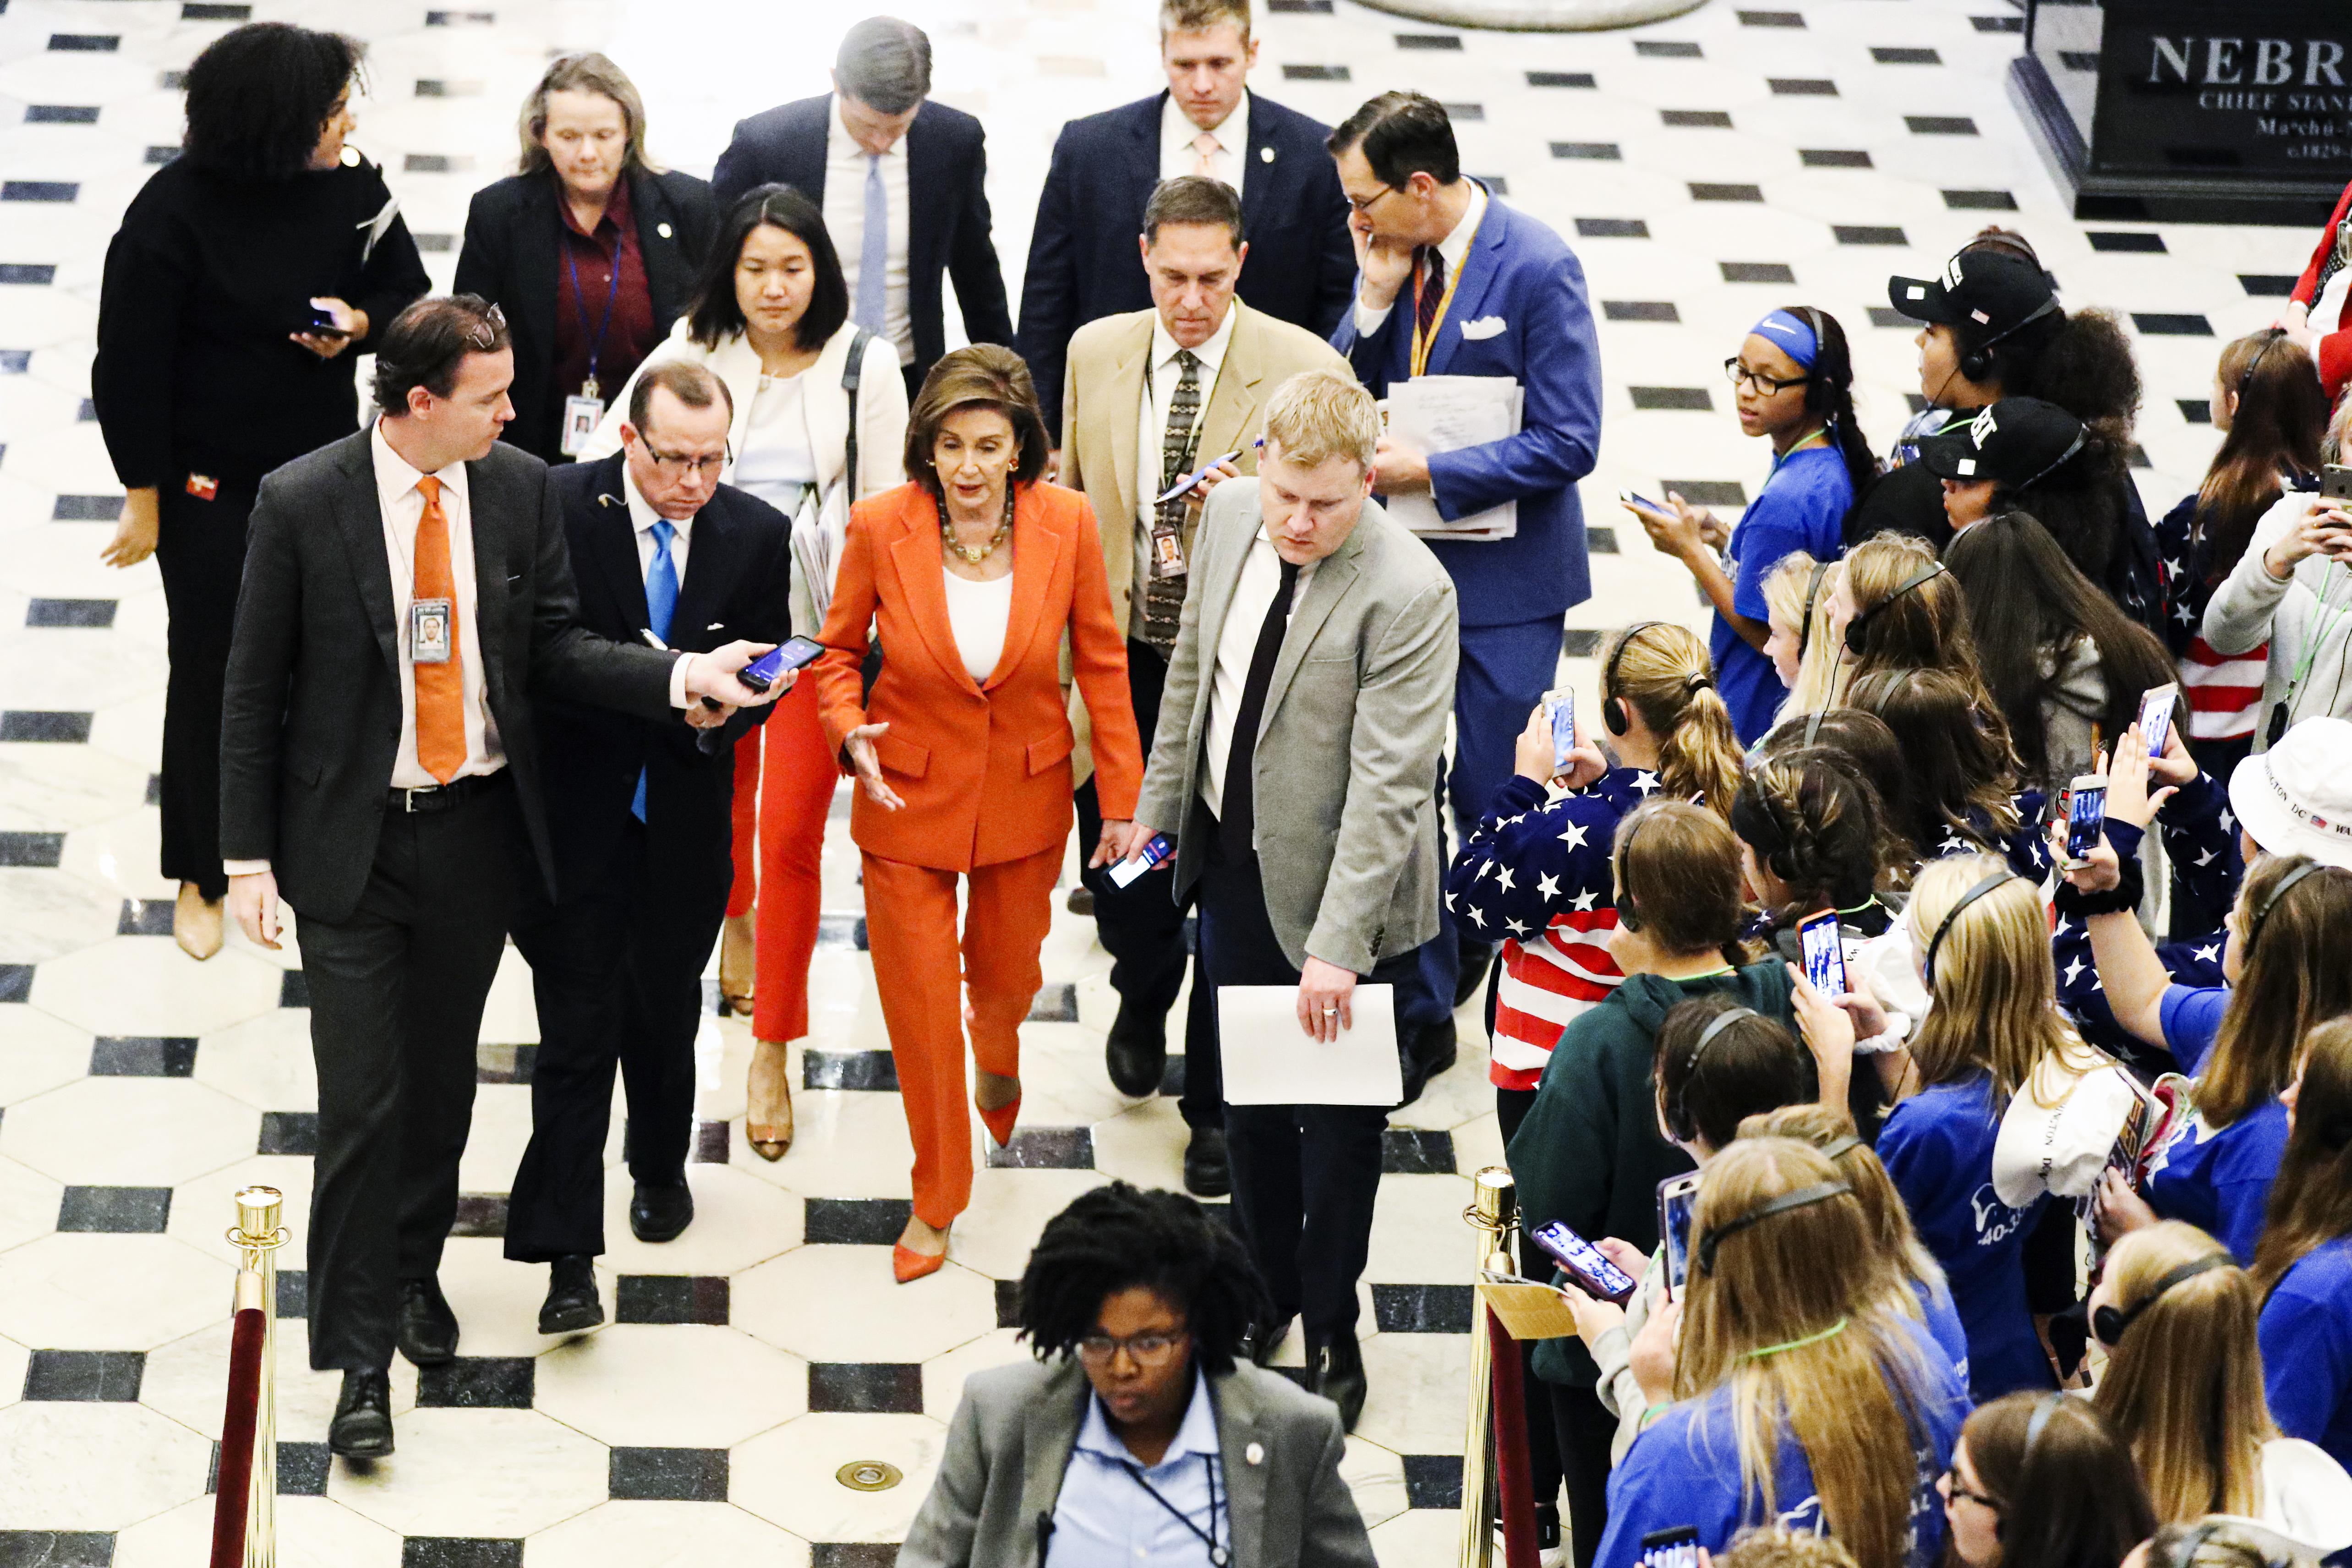 The House of Representatives' big impeachment vote, explained